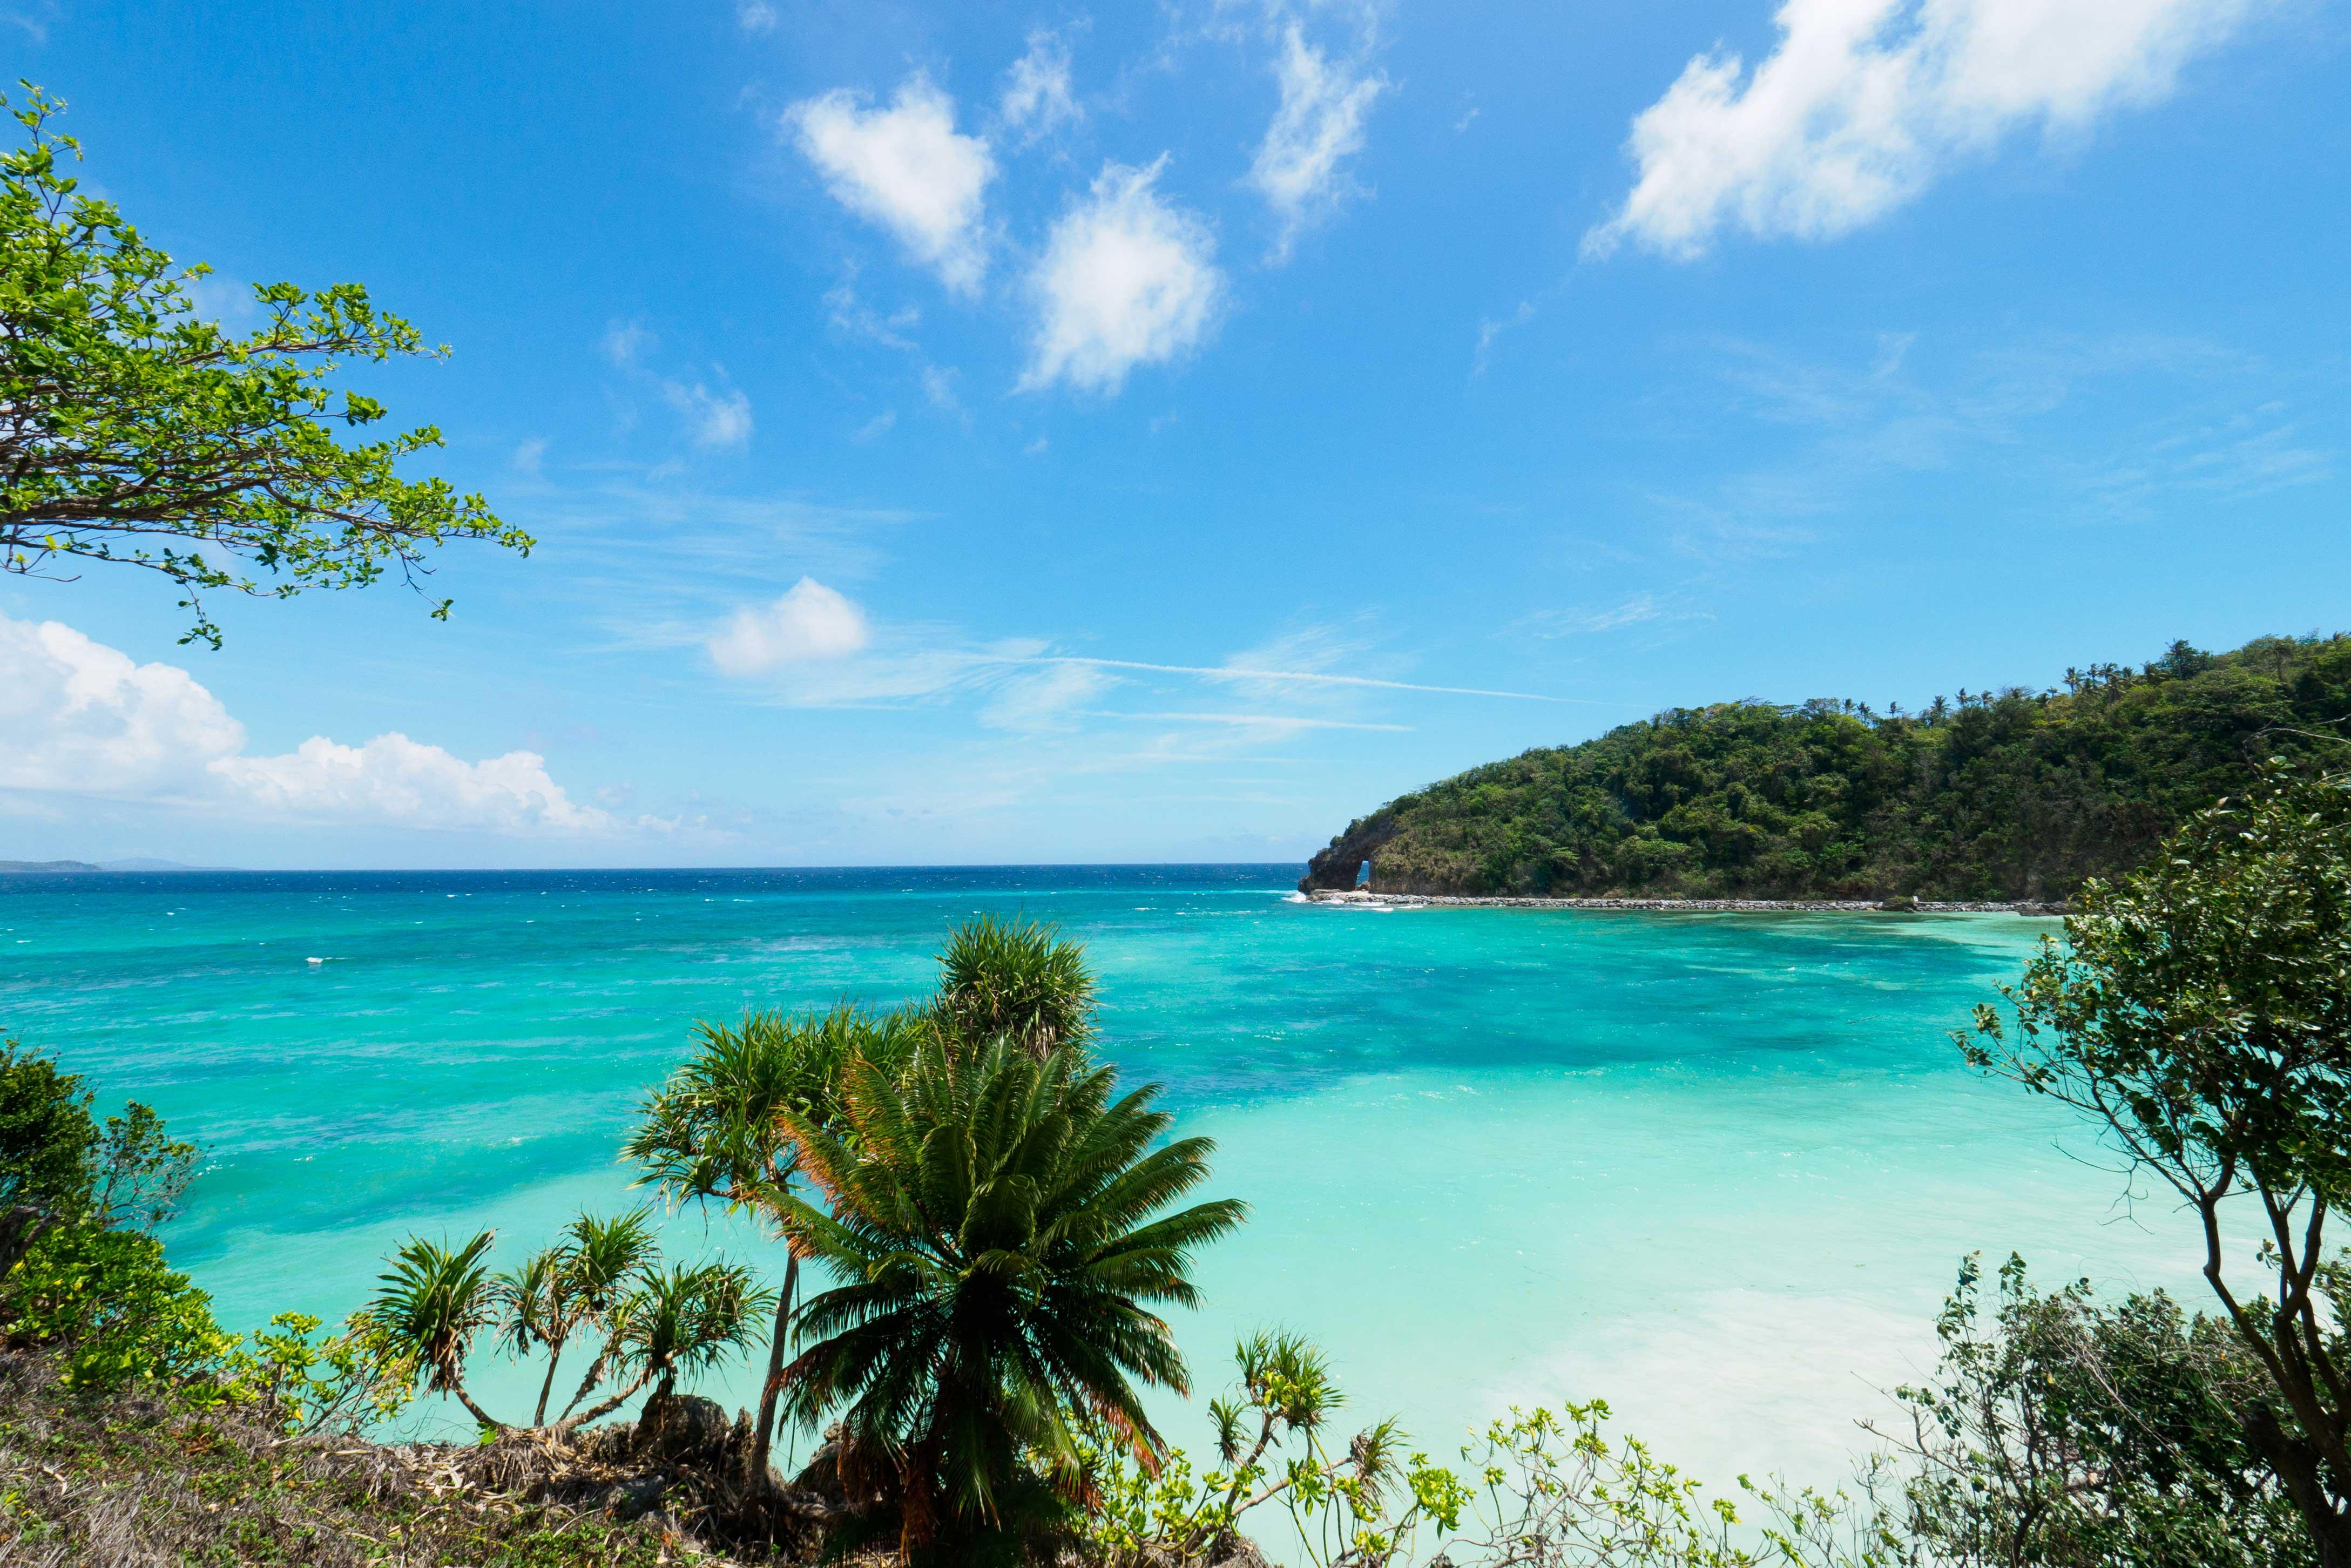 Beautiful beach in Boracay, Philippines